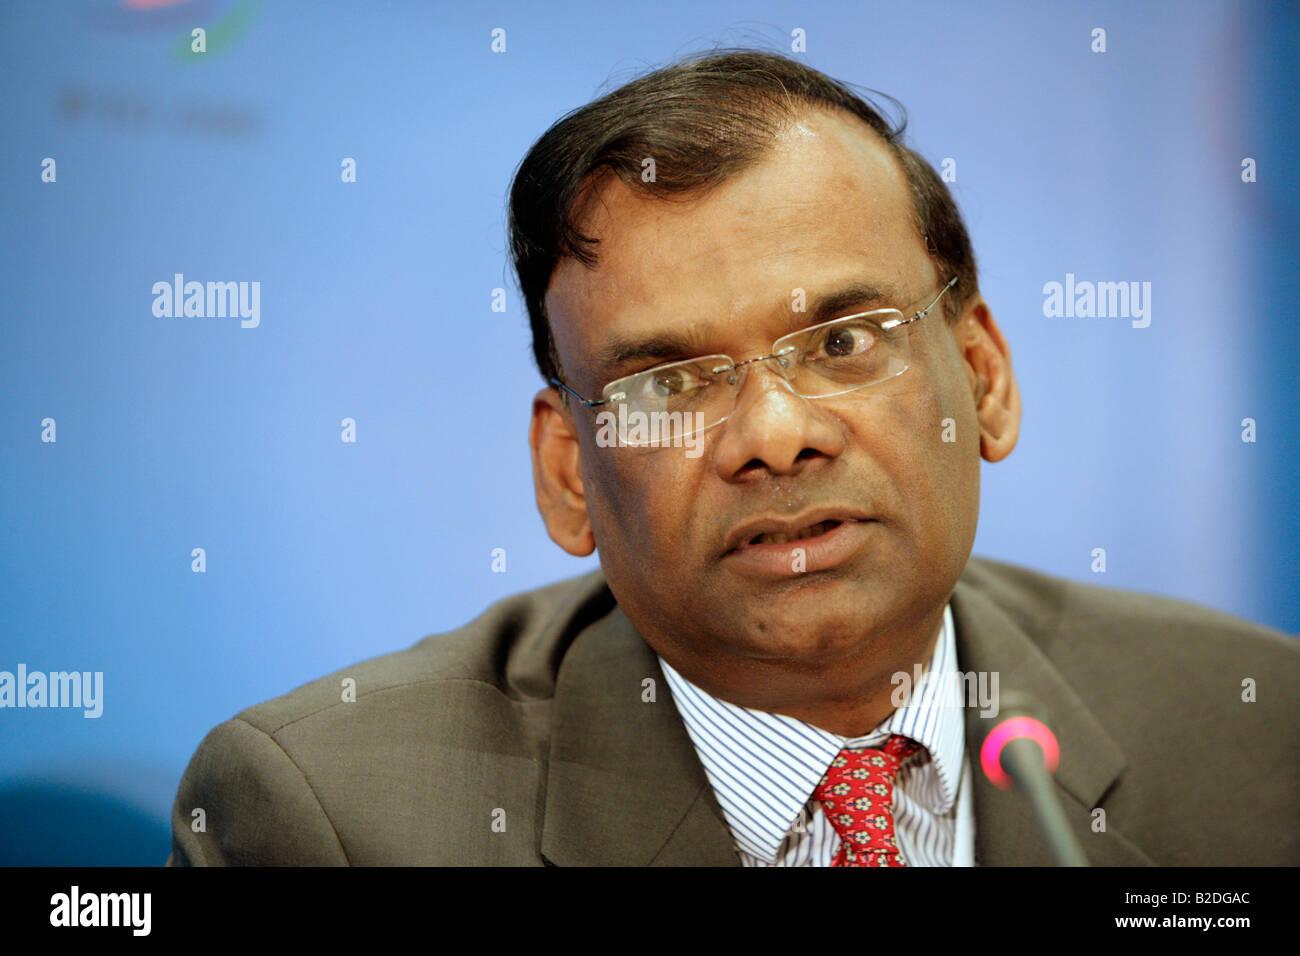 Ramakrishna Sithanen - Deputy Prime Minister,  Minister of Finance and Economic Development of Republic of Mauritius. - Stock Image